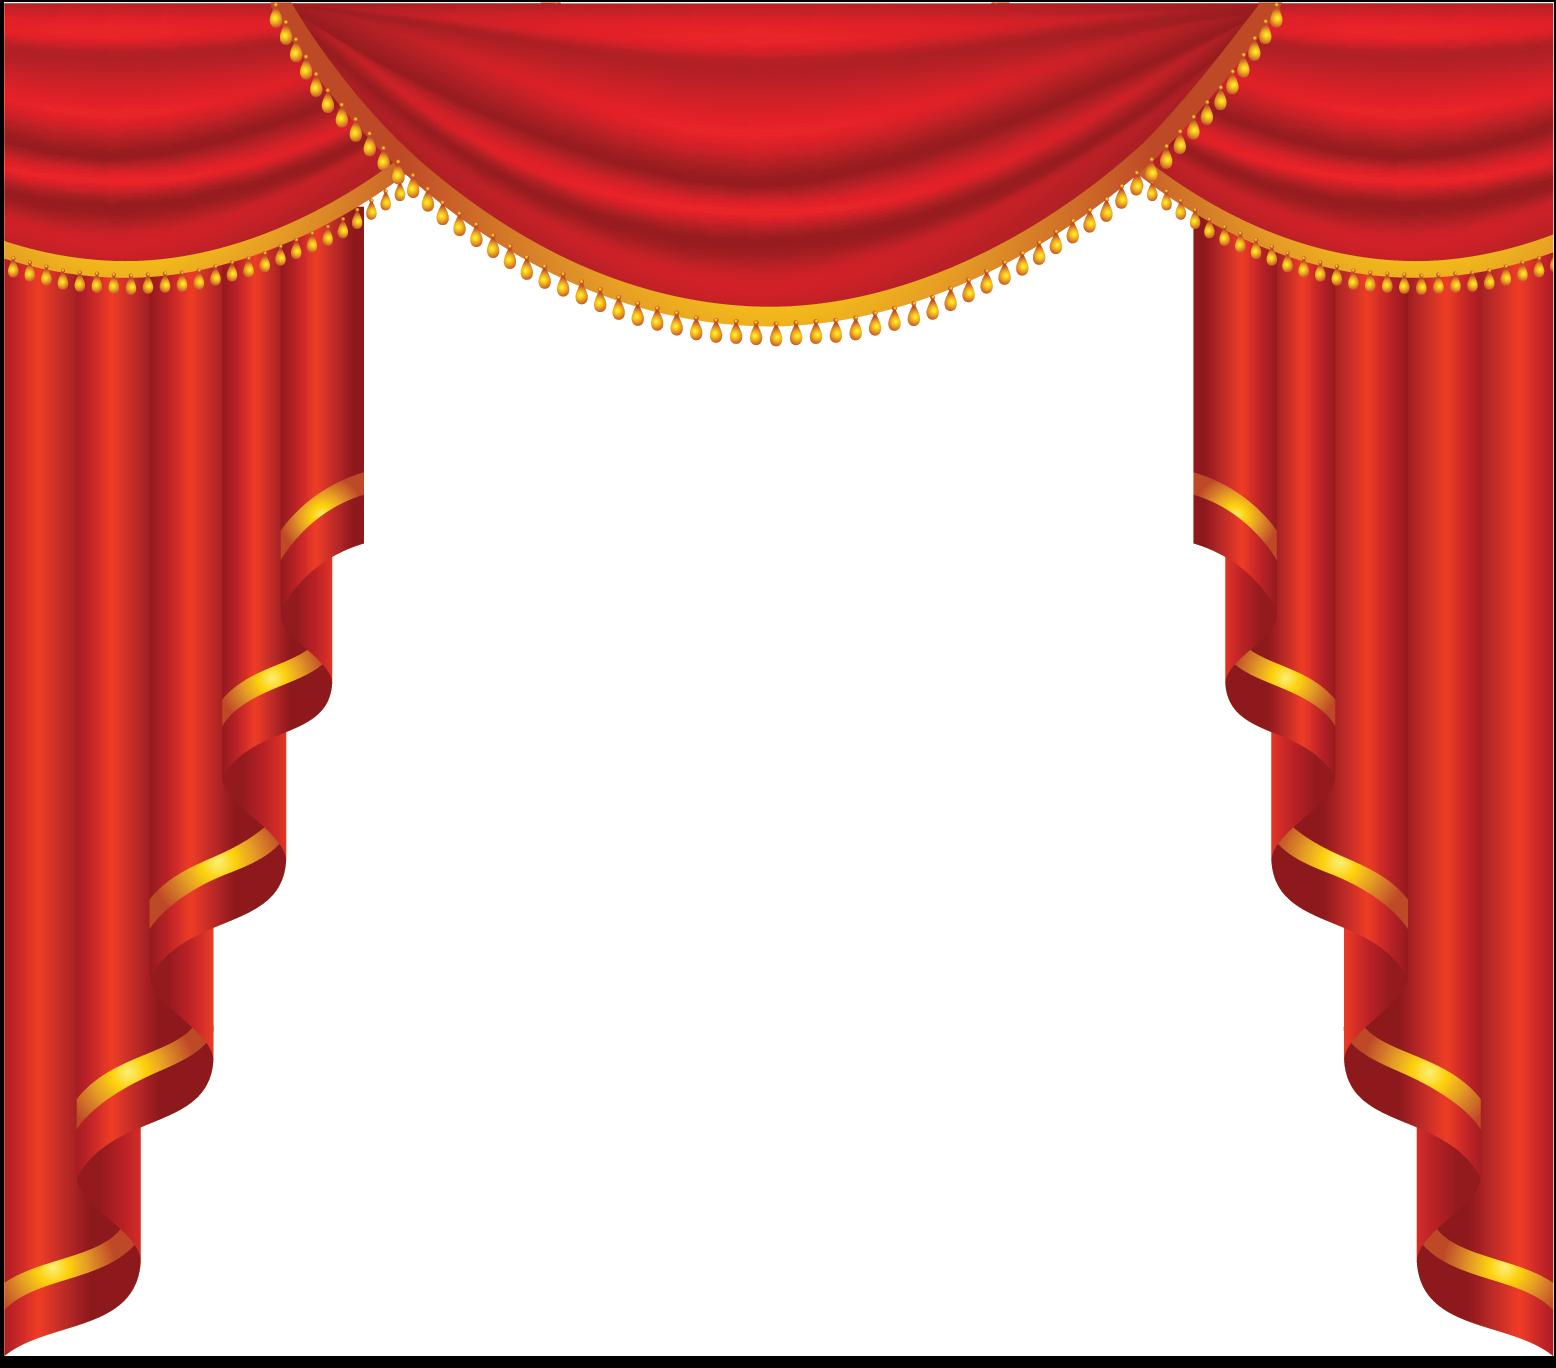 Curtains musical theatre